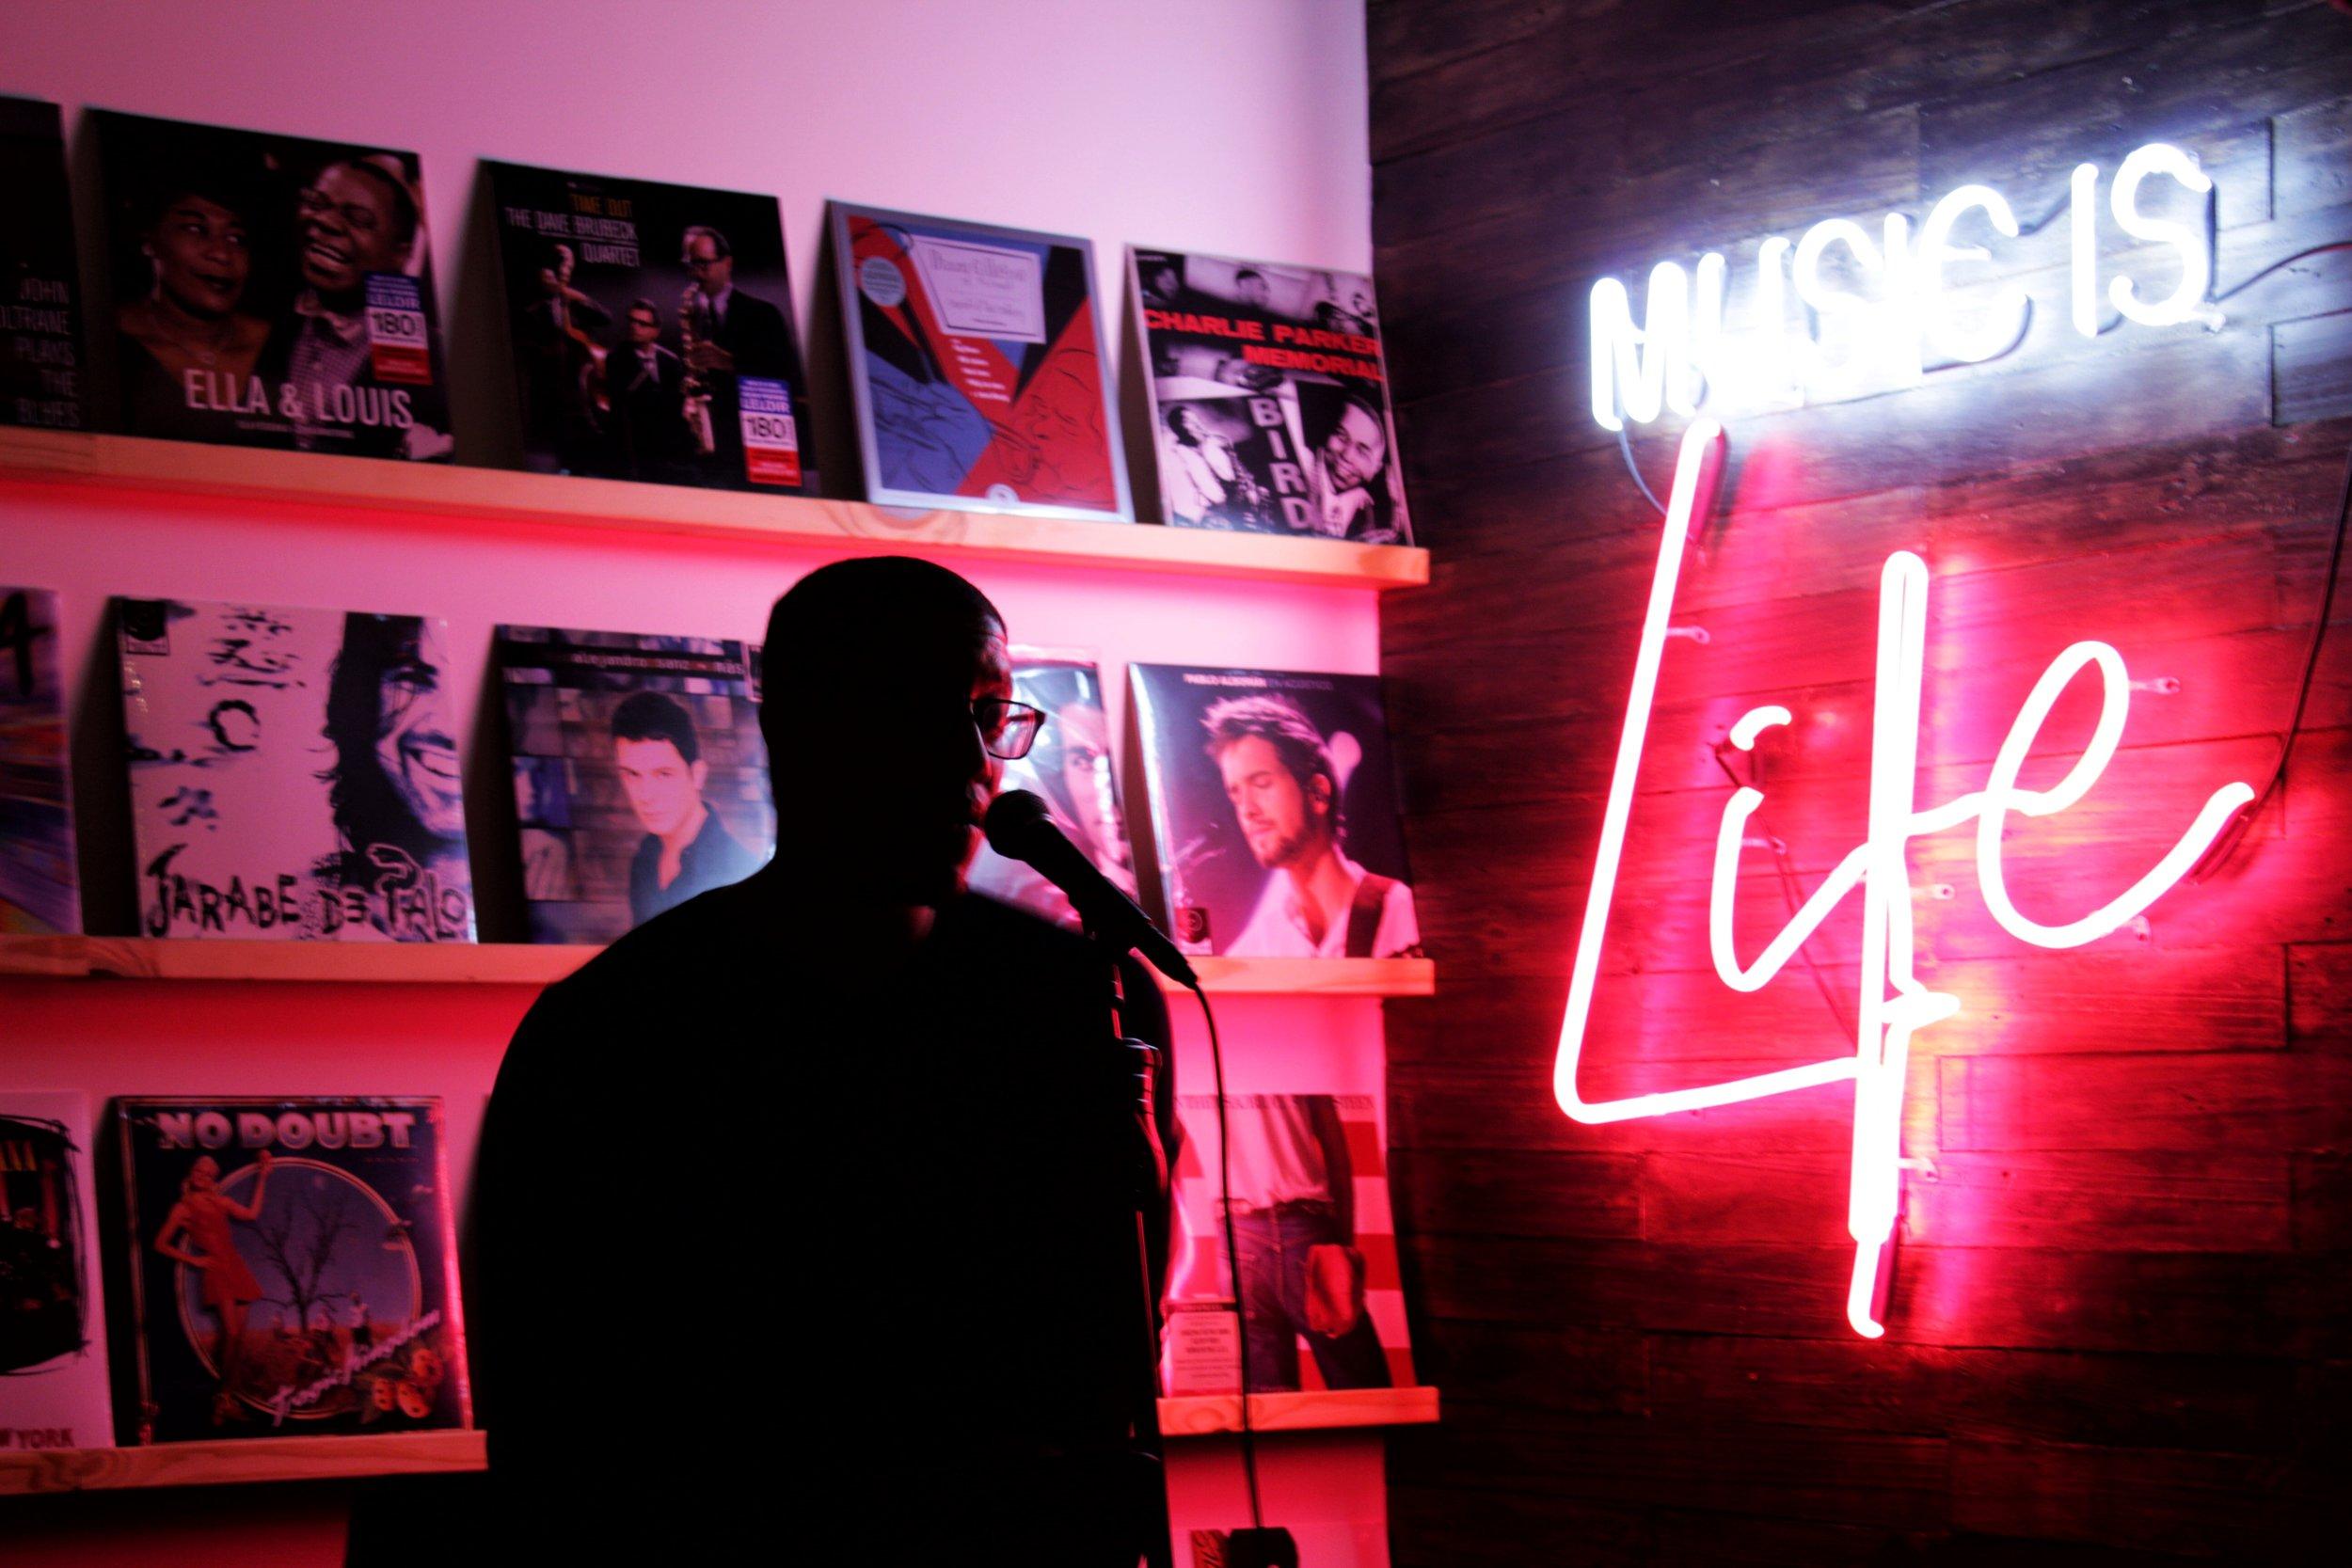 Edwin Hosoomel - Music is Life